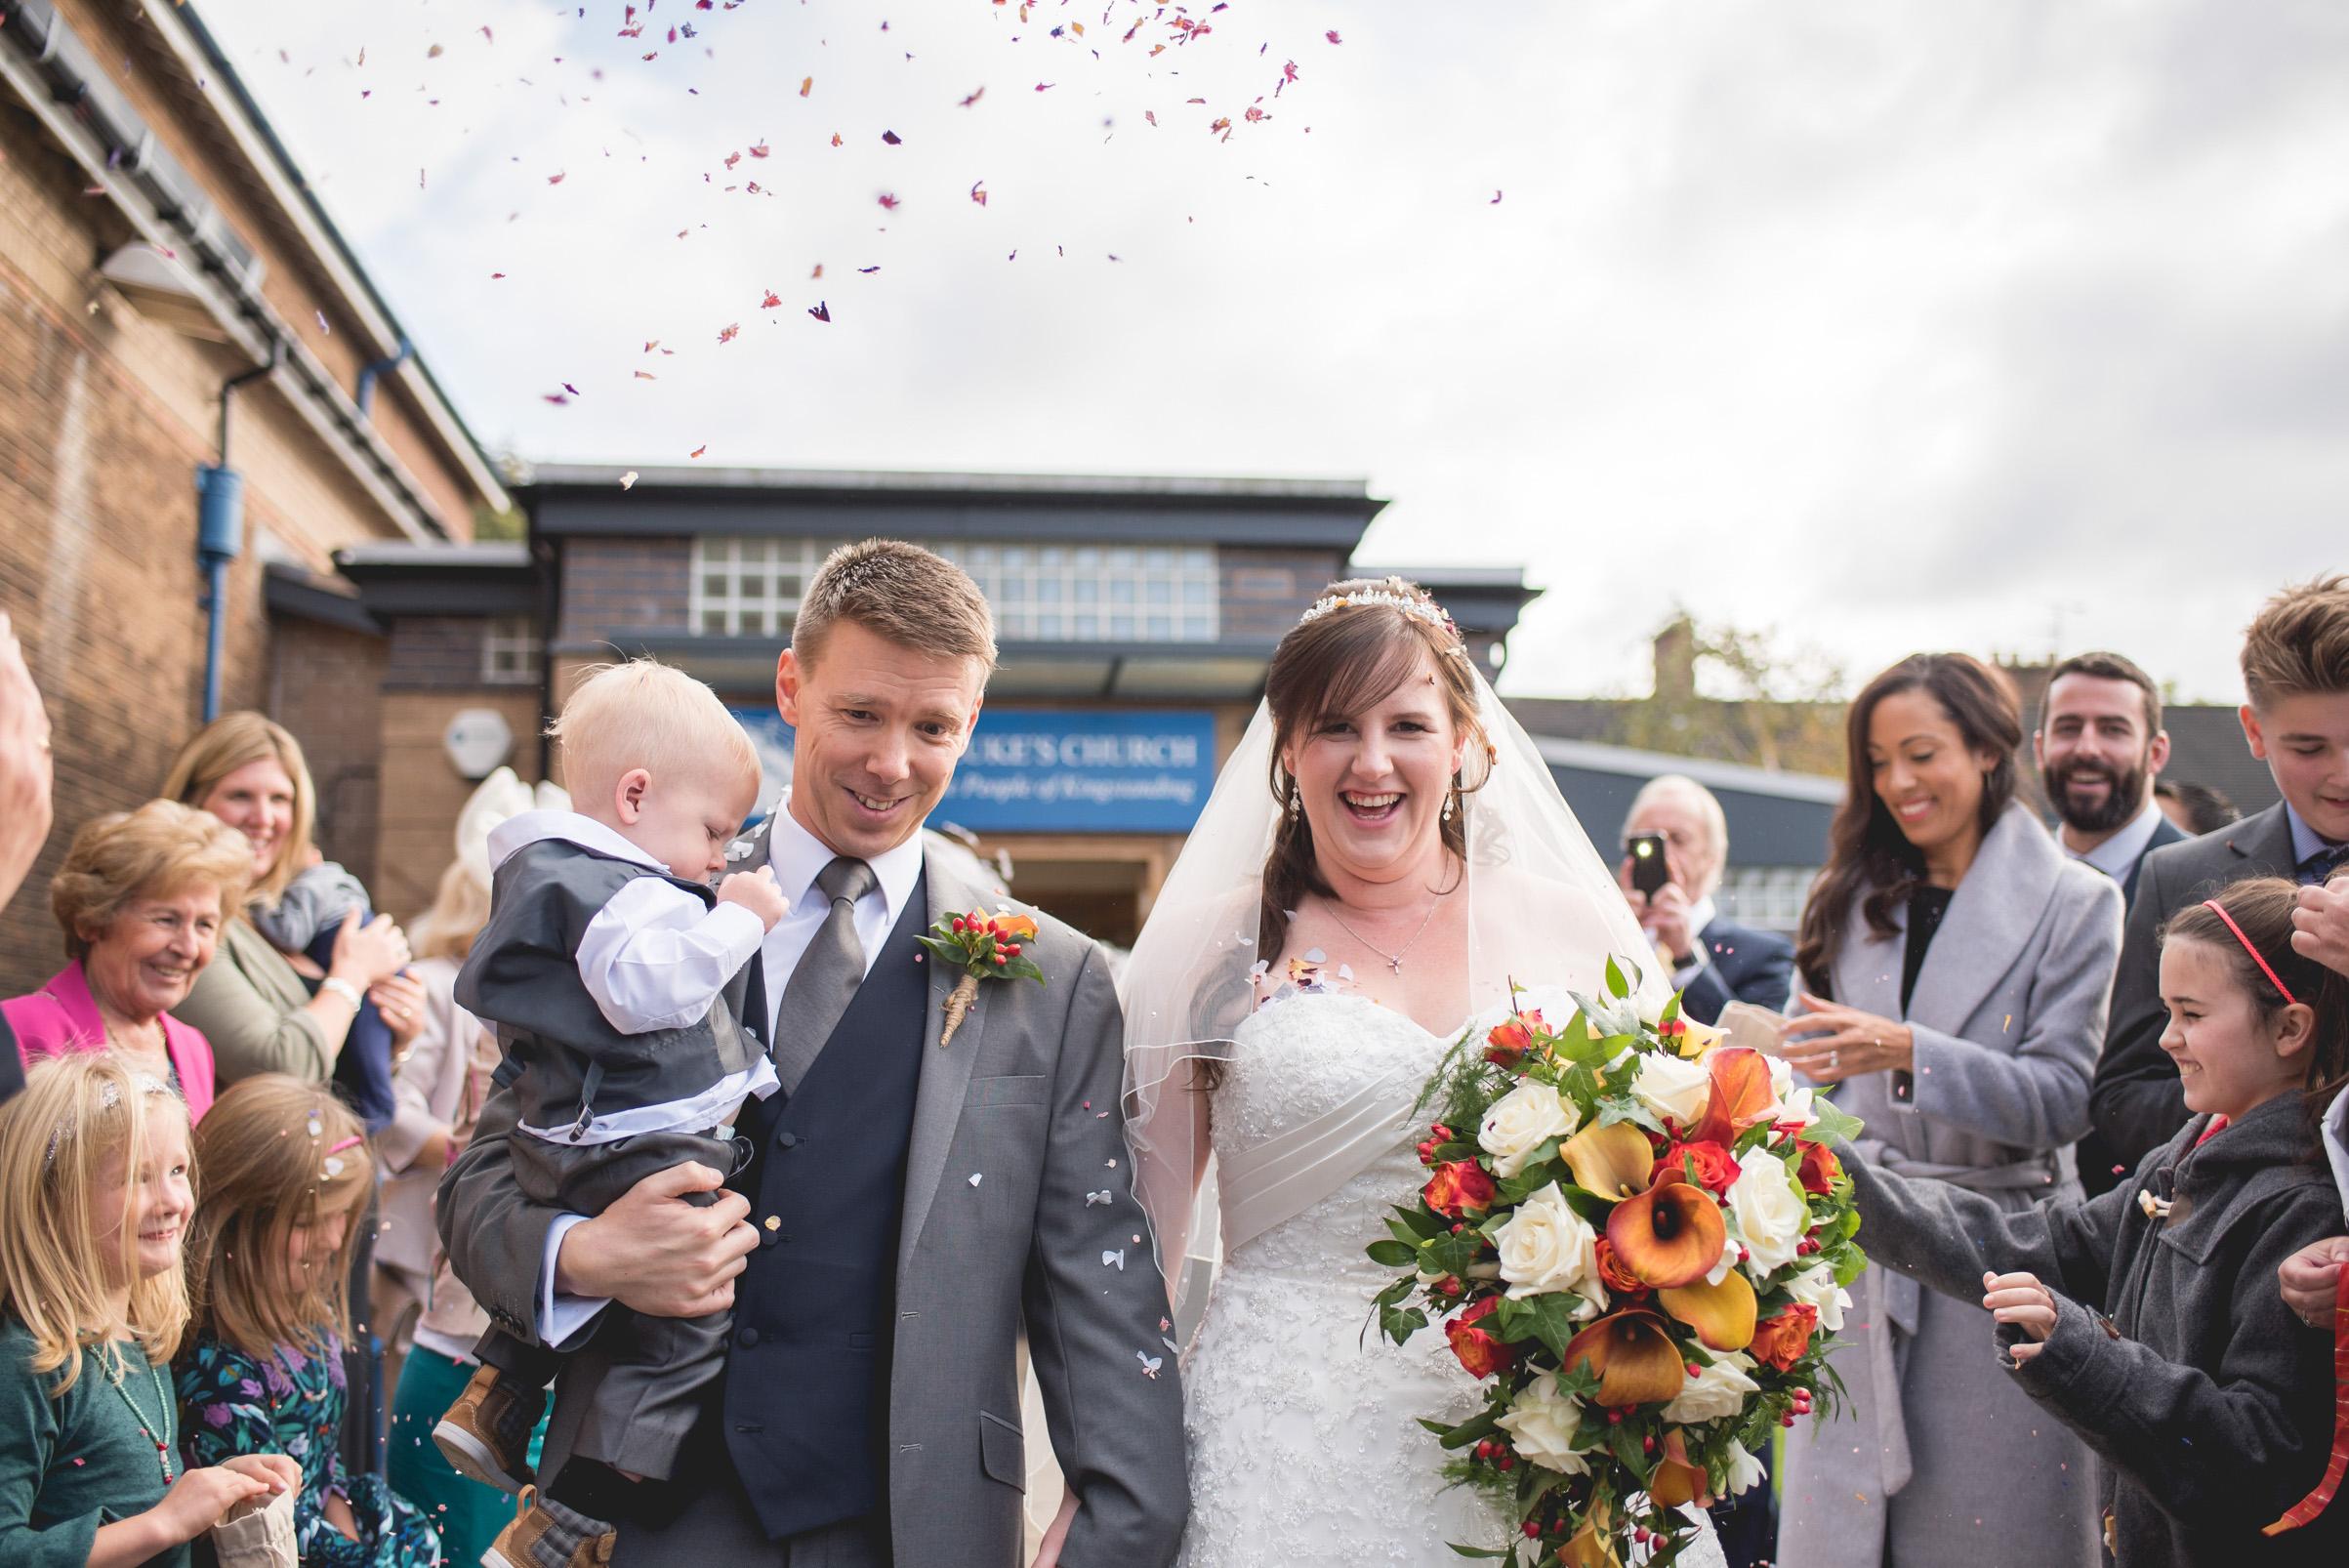 The+Fairlawns+wedding+Aldridge+StLukes+Church-117.jpg